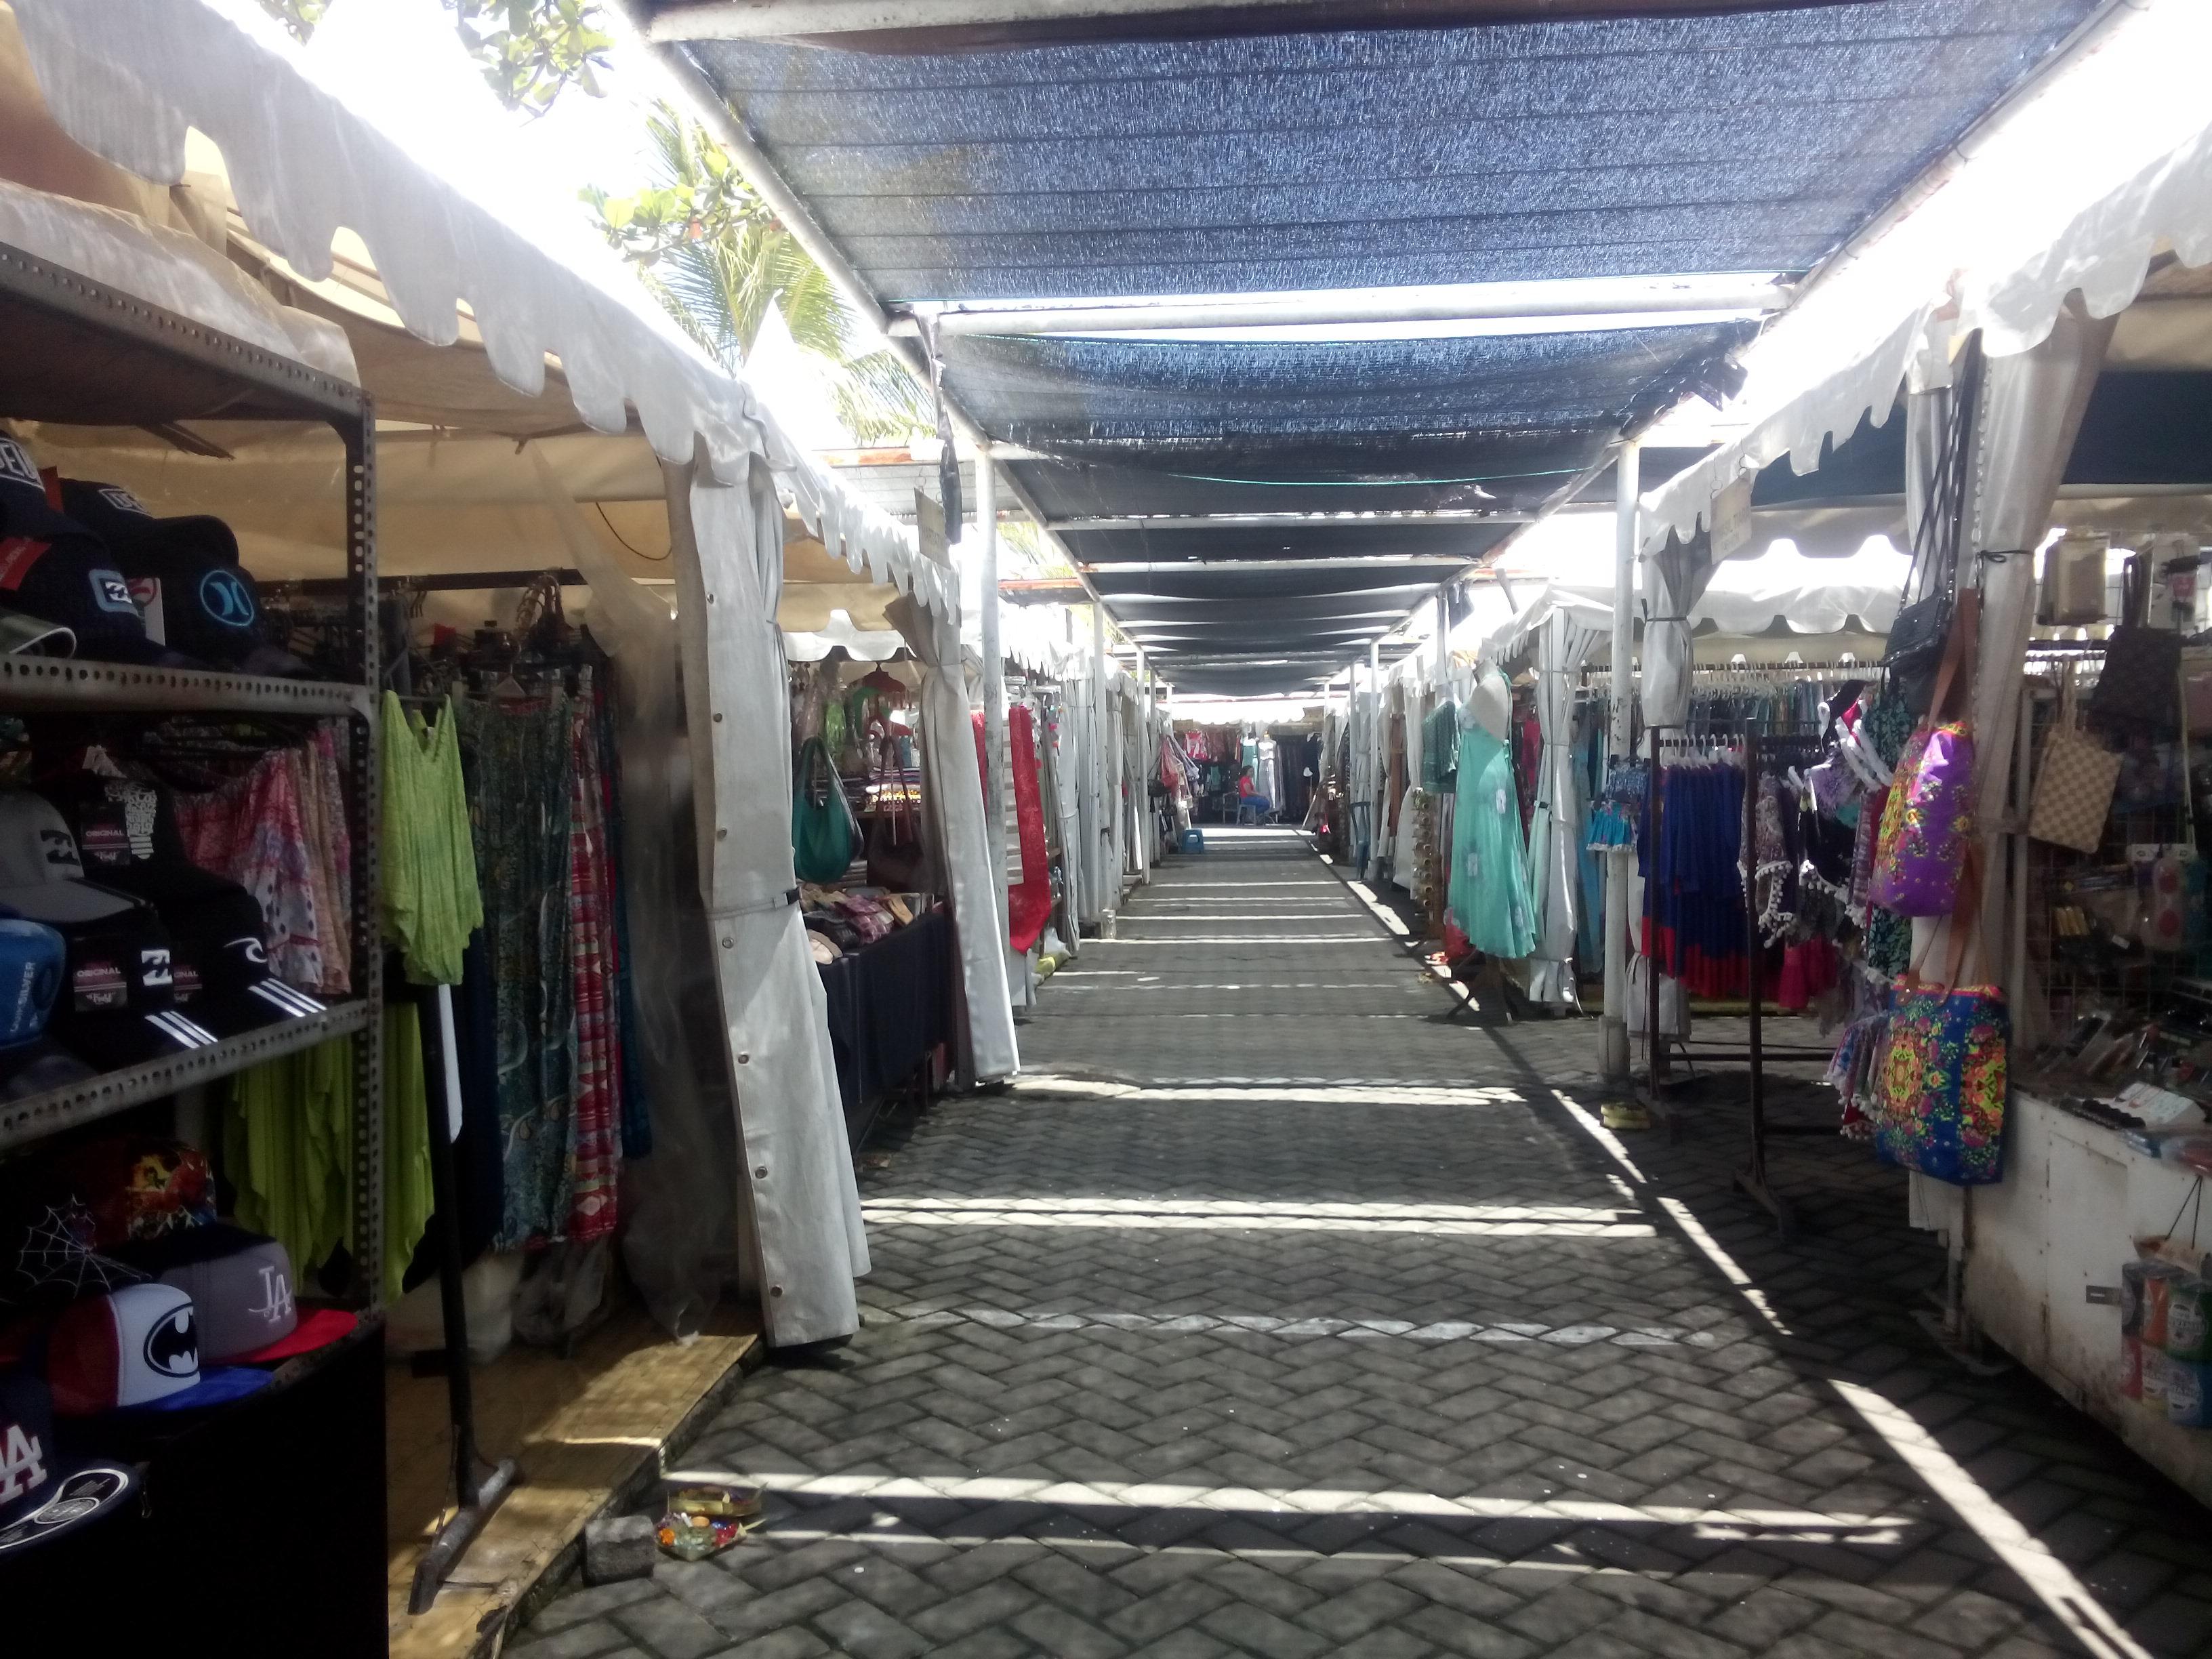 Market stalls undercover